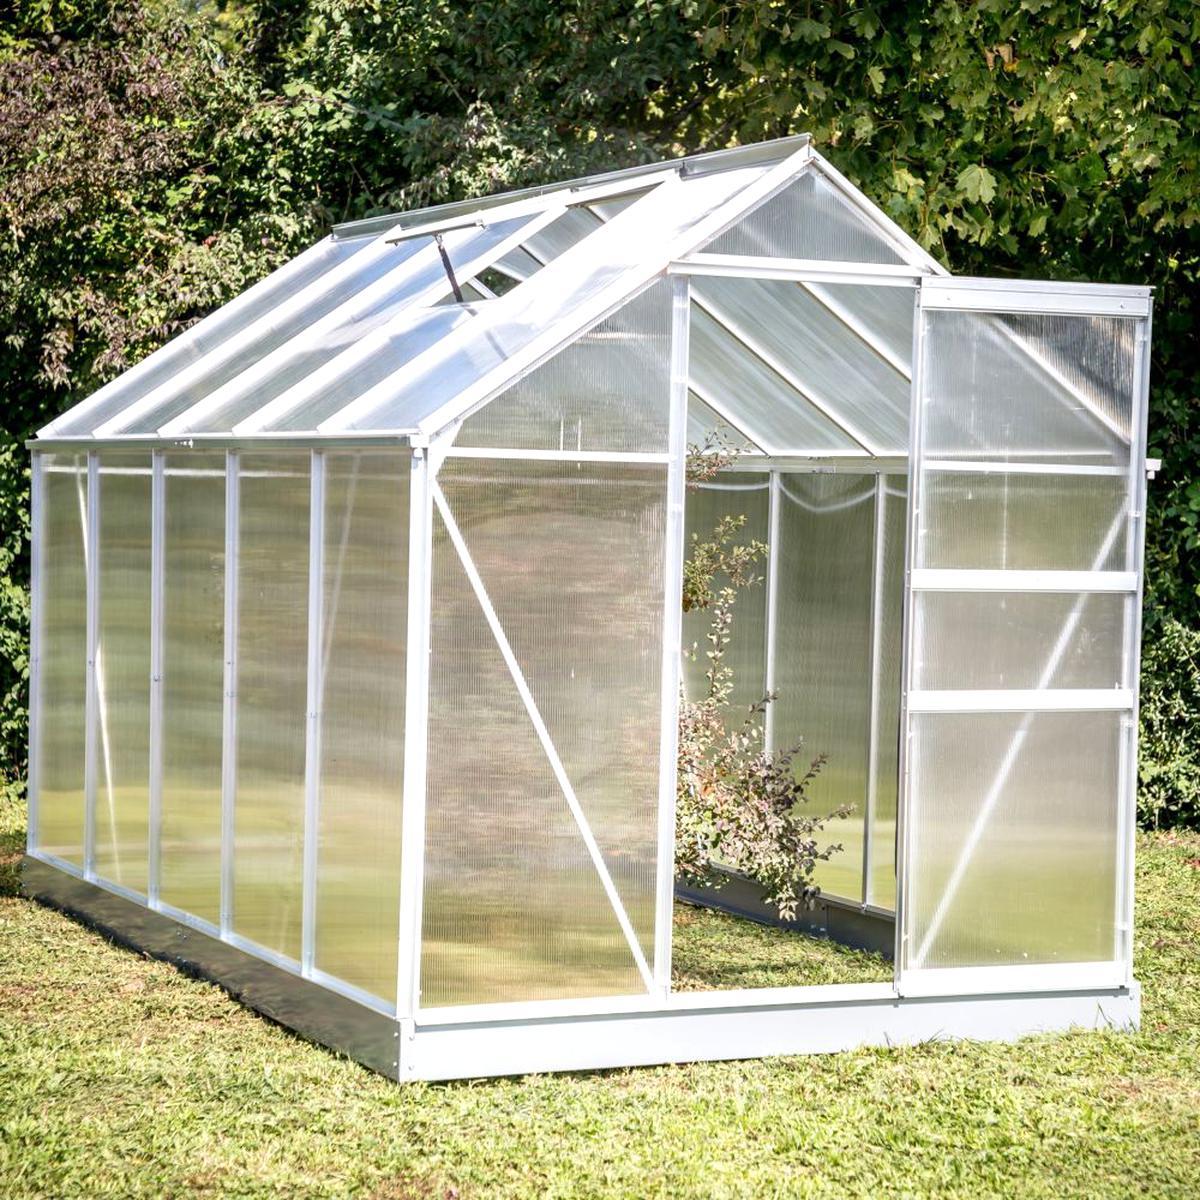 Serre Polycarbonate D'occasion concernant Serre De Jardin Occasion A Vendre